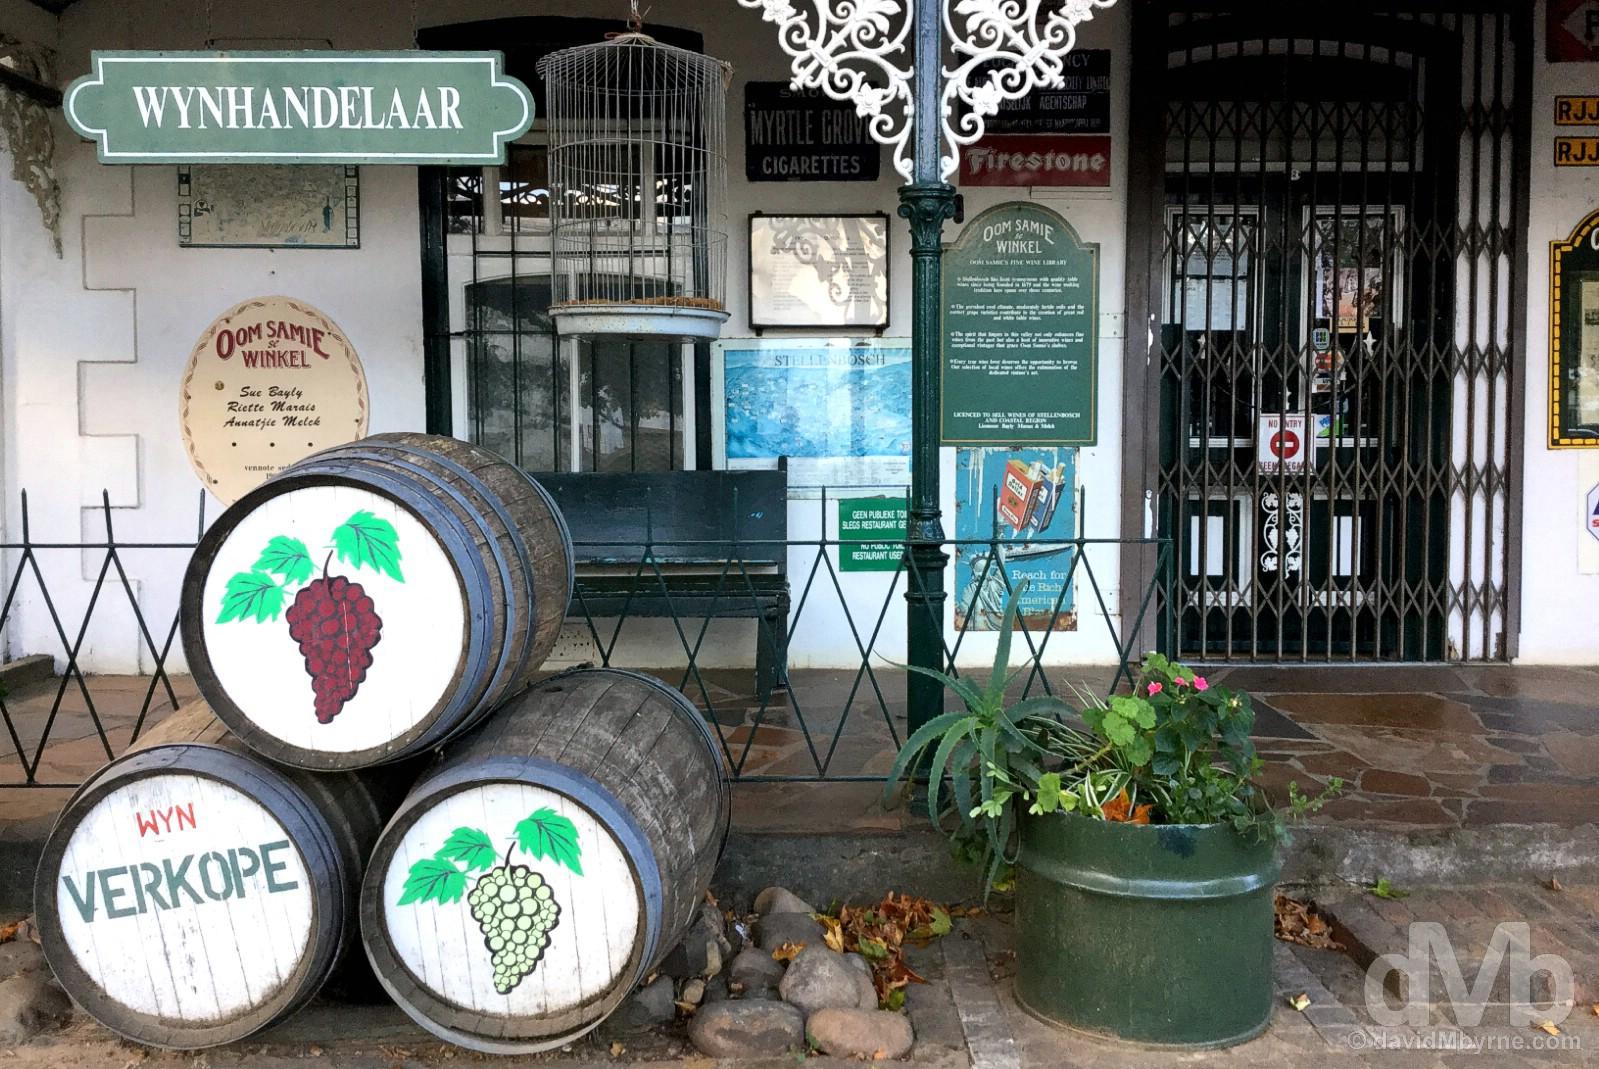 A wine shop on Dorp Street, Stellenbosch, Western Cape, South Africa. February 18, 2017.